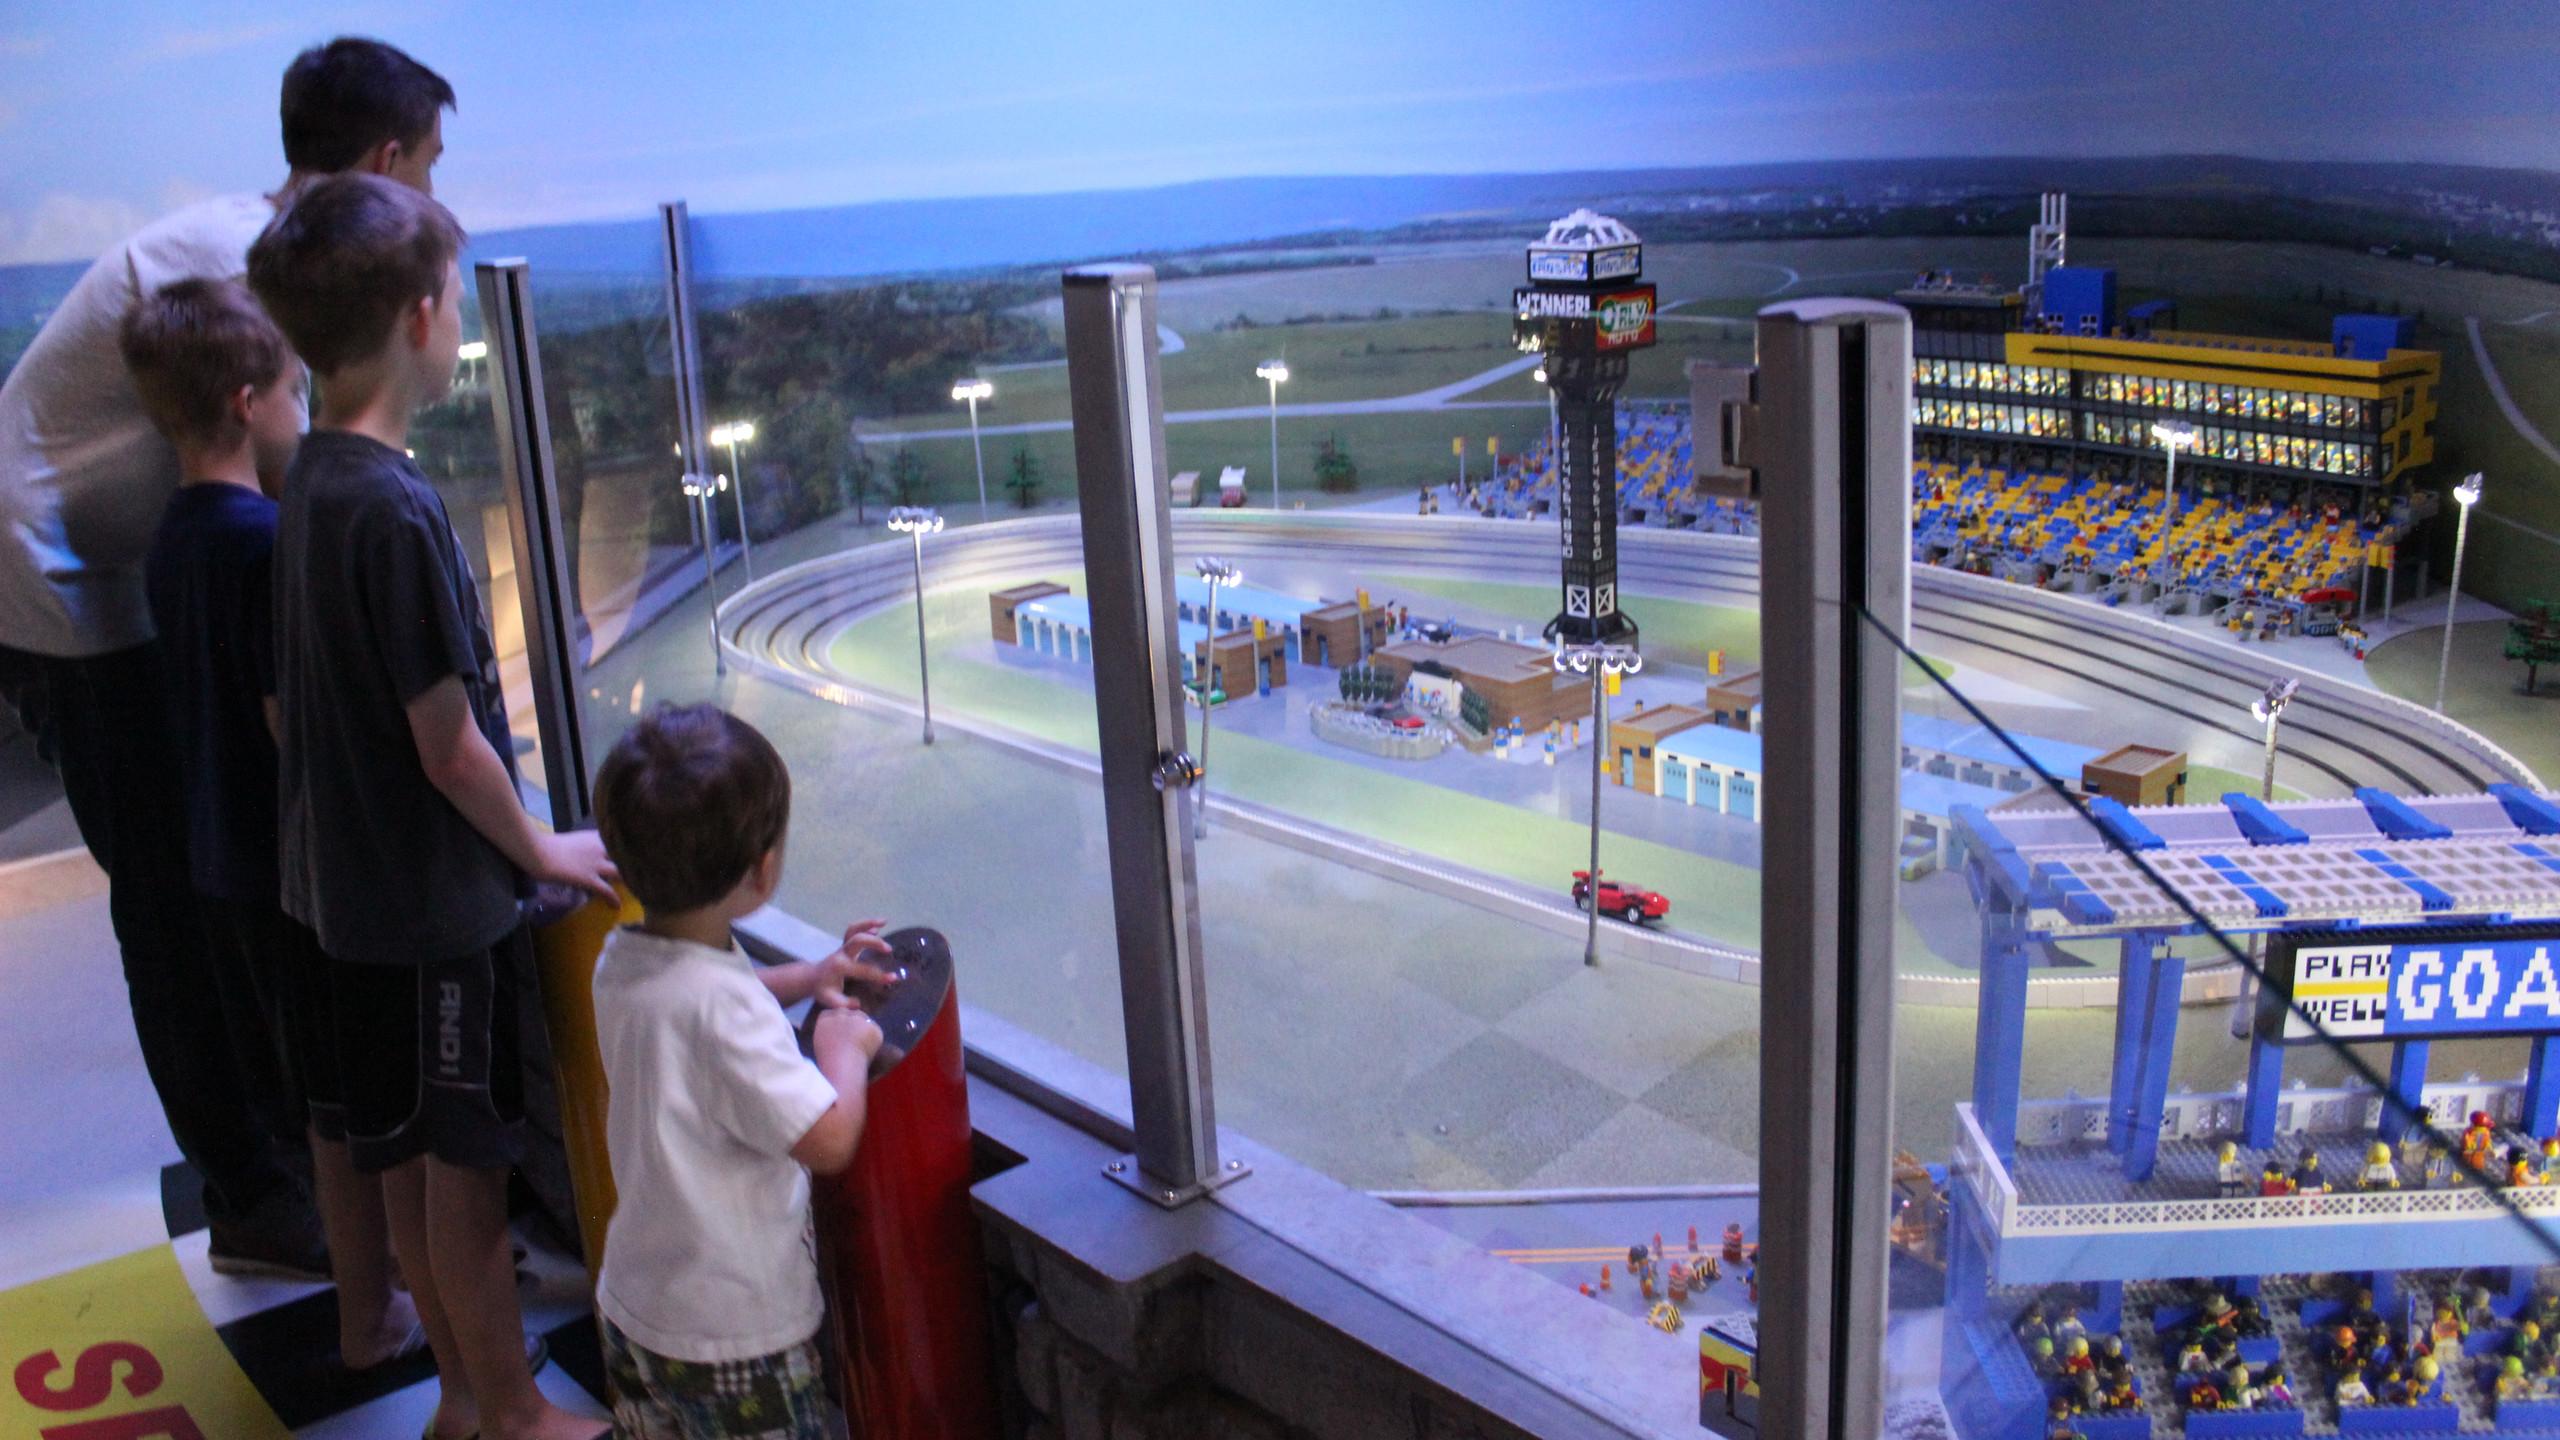 MINILAND Kansas Speedway built in LEGO bricks at the LEGOLAND Discovery Center in Kansas City